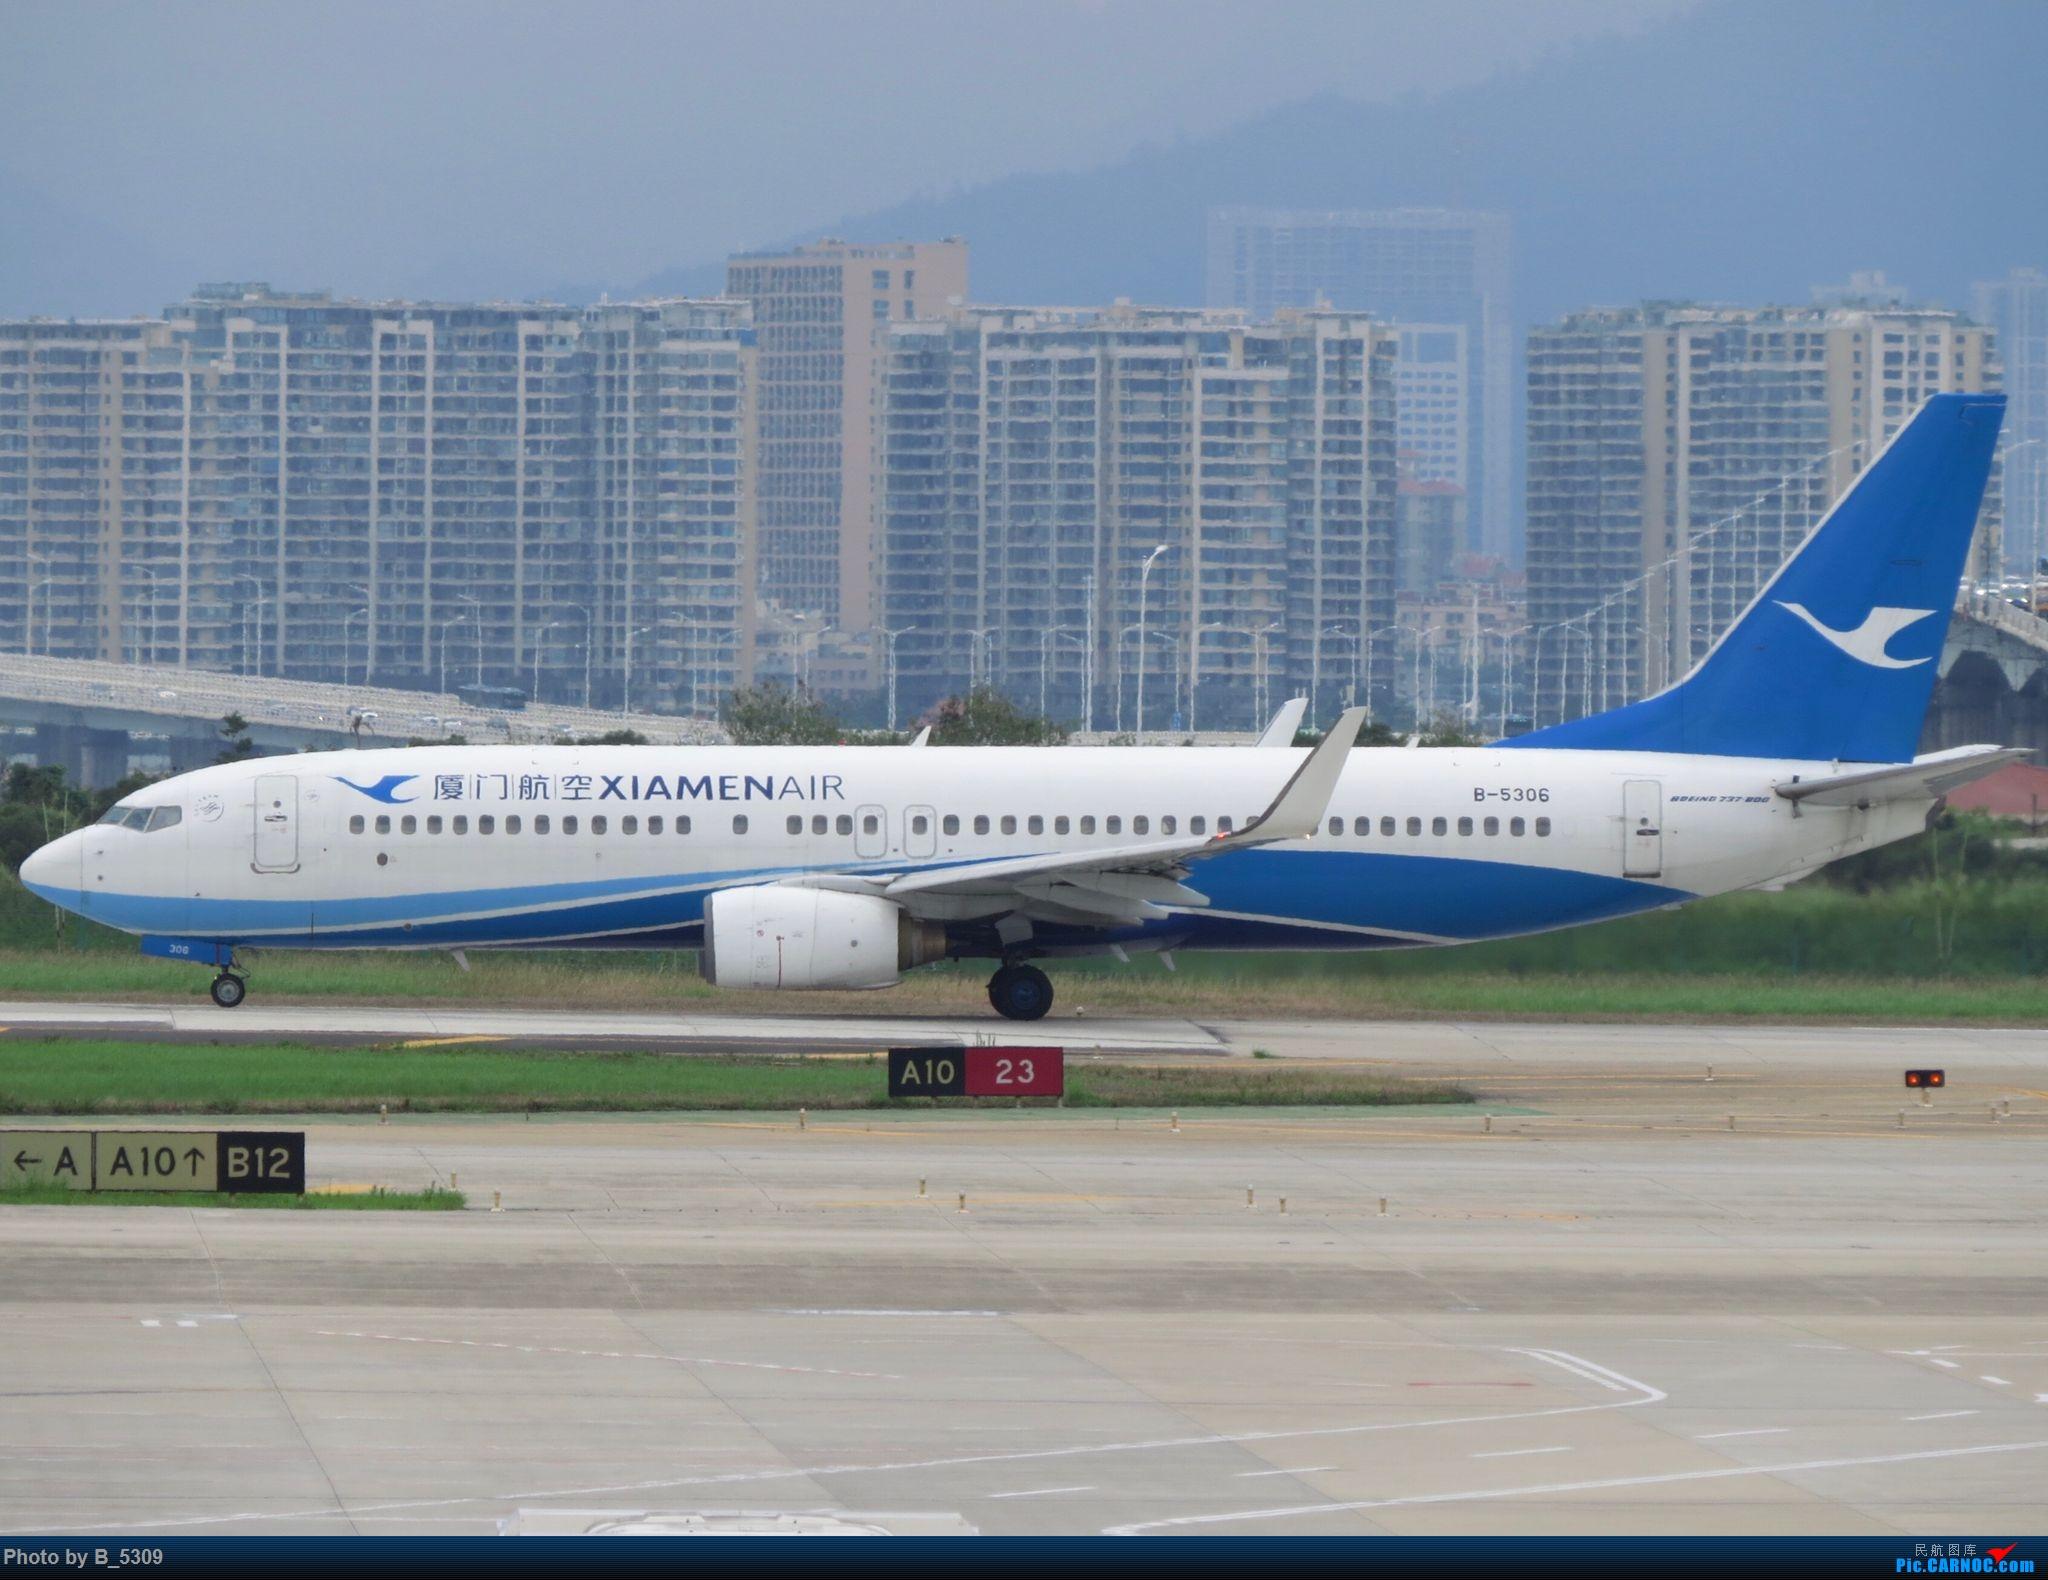 Re:[原创]复课一个月了,终于能在紧张的学习生活中抽出点时间拍稽~ BOEING 737-800 B-5306 中国厦门高崎国际机场